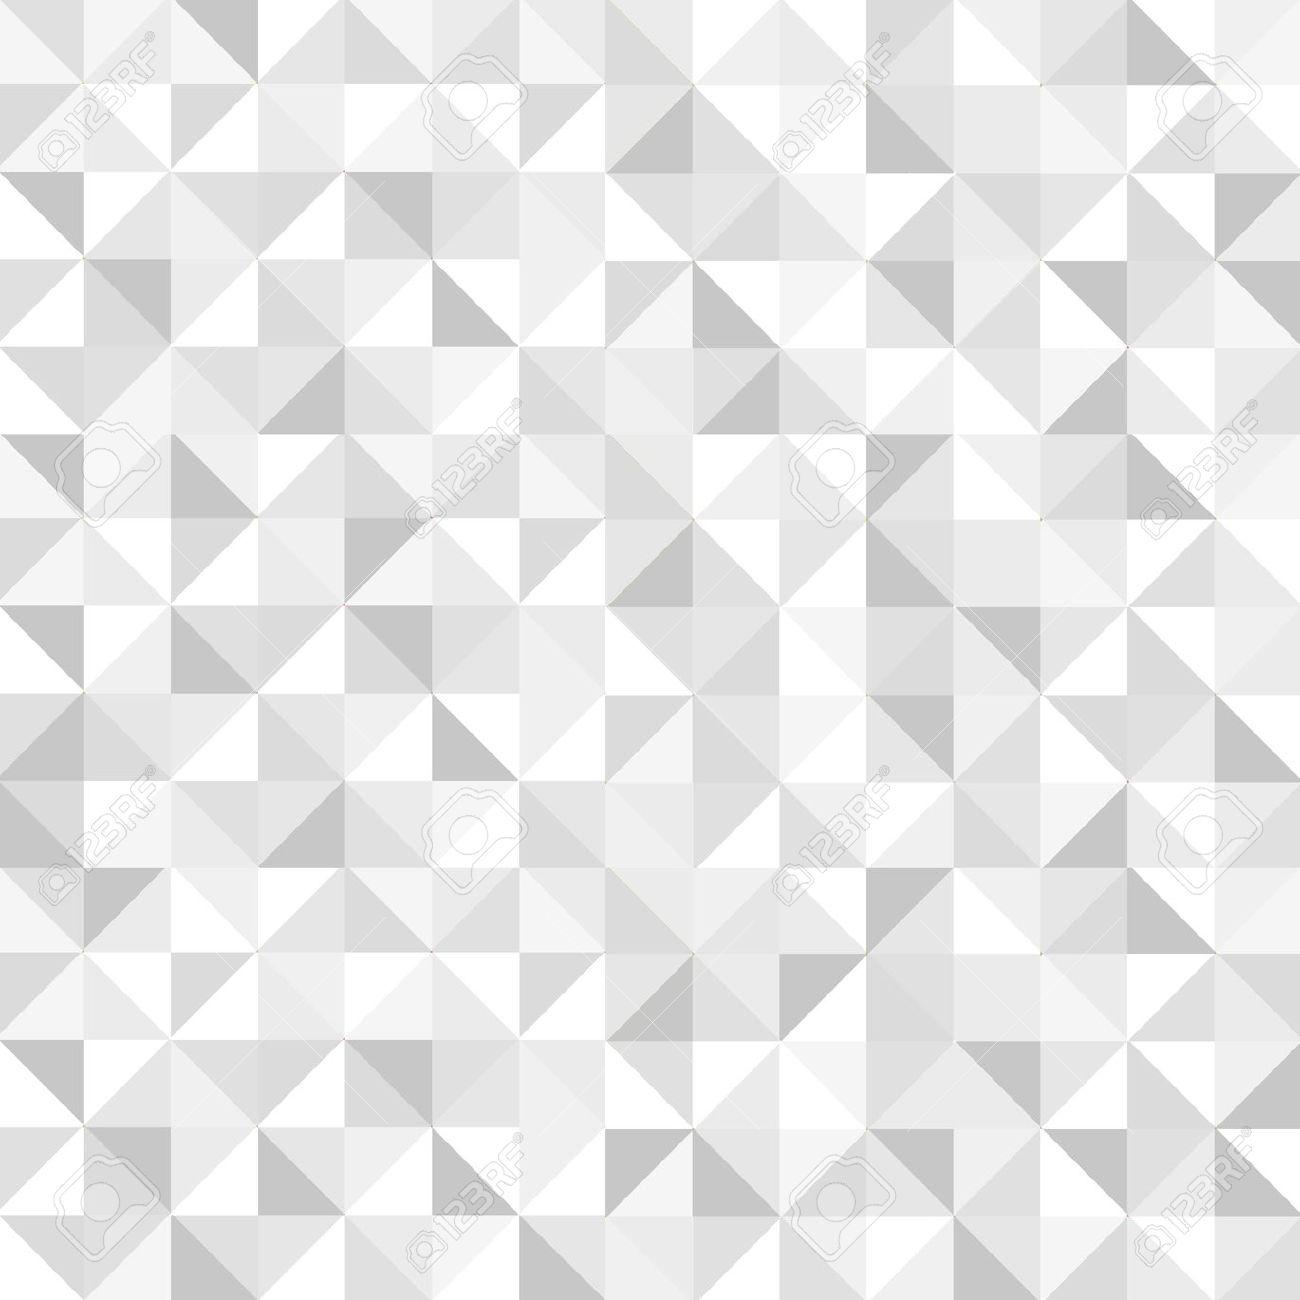 FunMozar Geometric Triangle Wallpapers 1300x1300